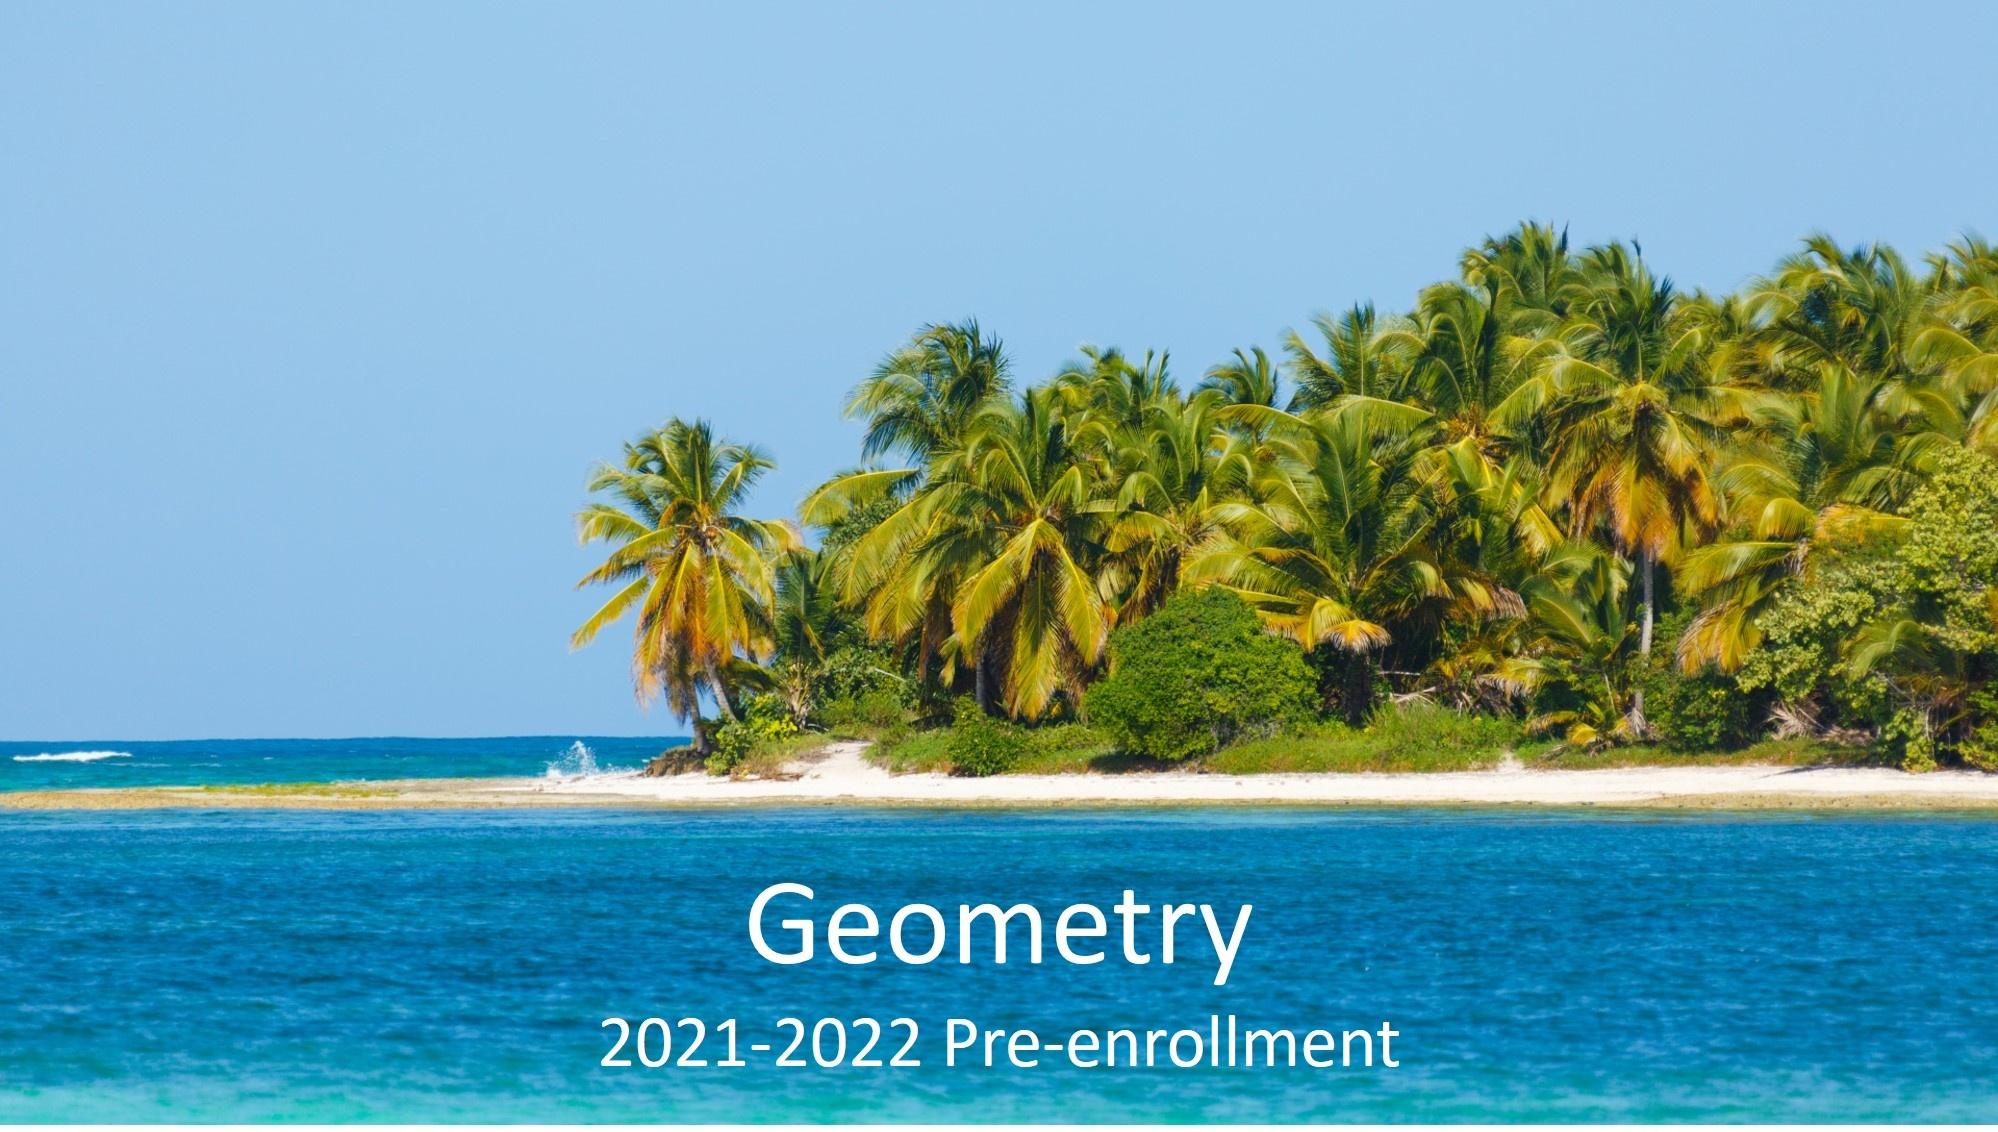 Geometry, Section 1: 2021-2022 Pre-enrollment